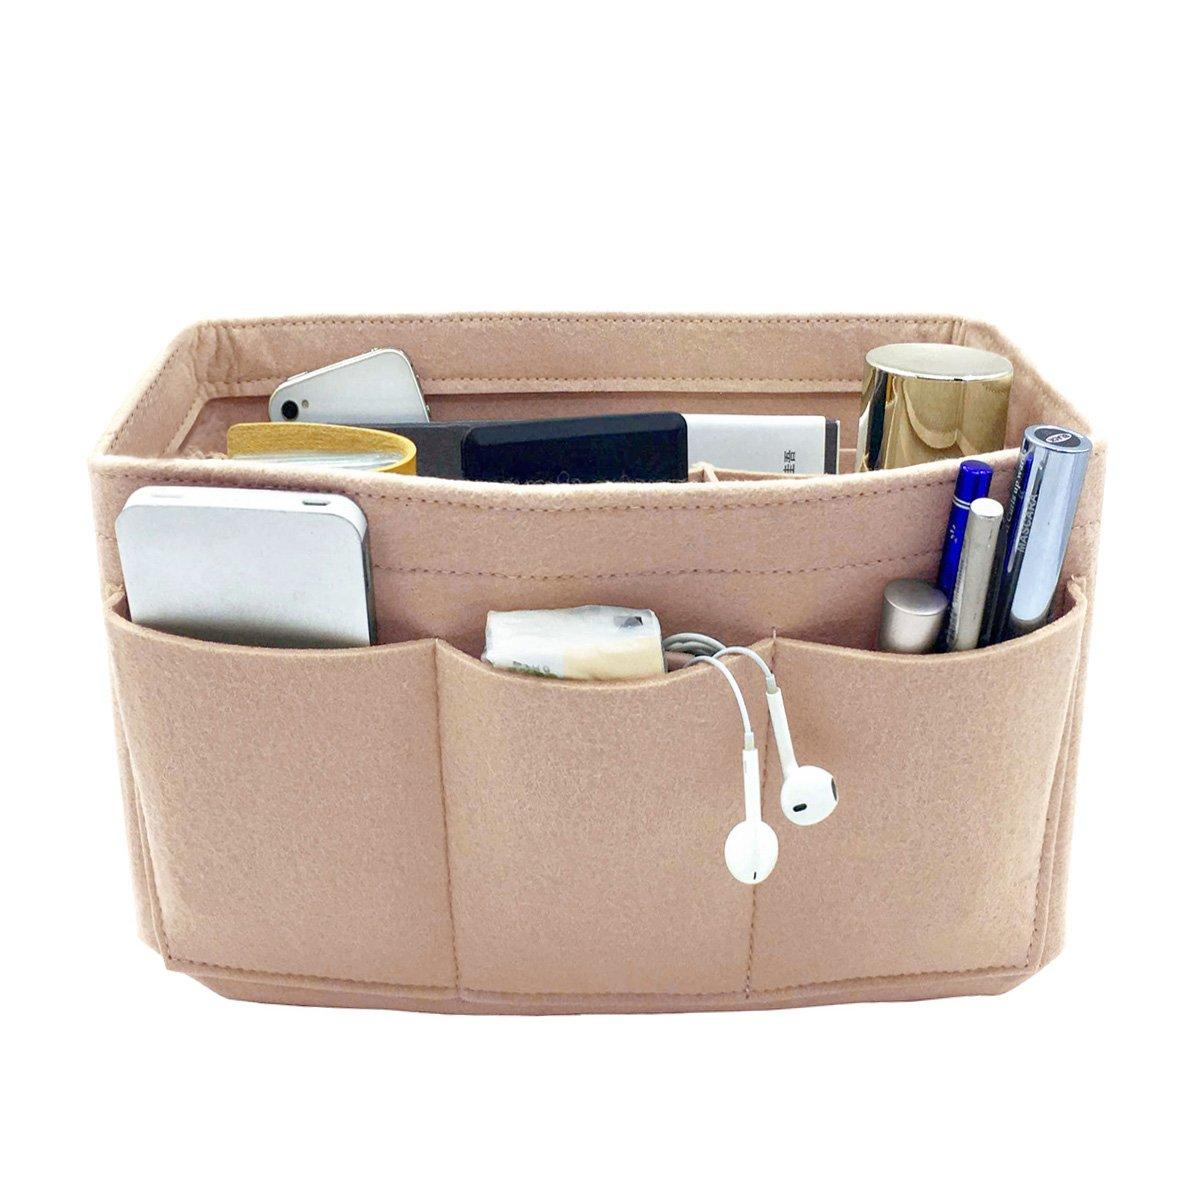 VANCORE 12 Pockets Felt Purses and Handbag Organizer Insert Cosmetic Bag Perfect Gift for Women Nude M